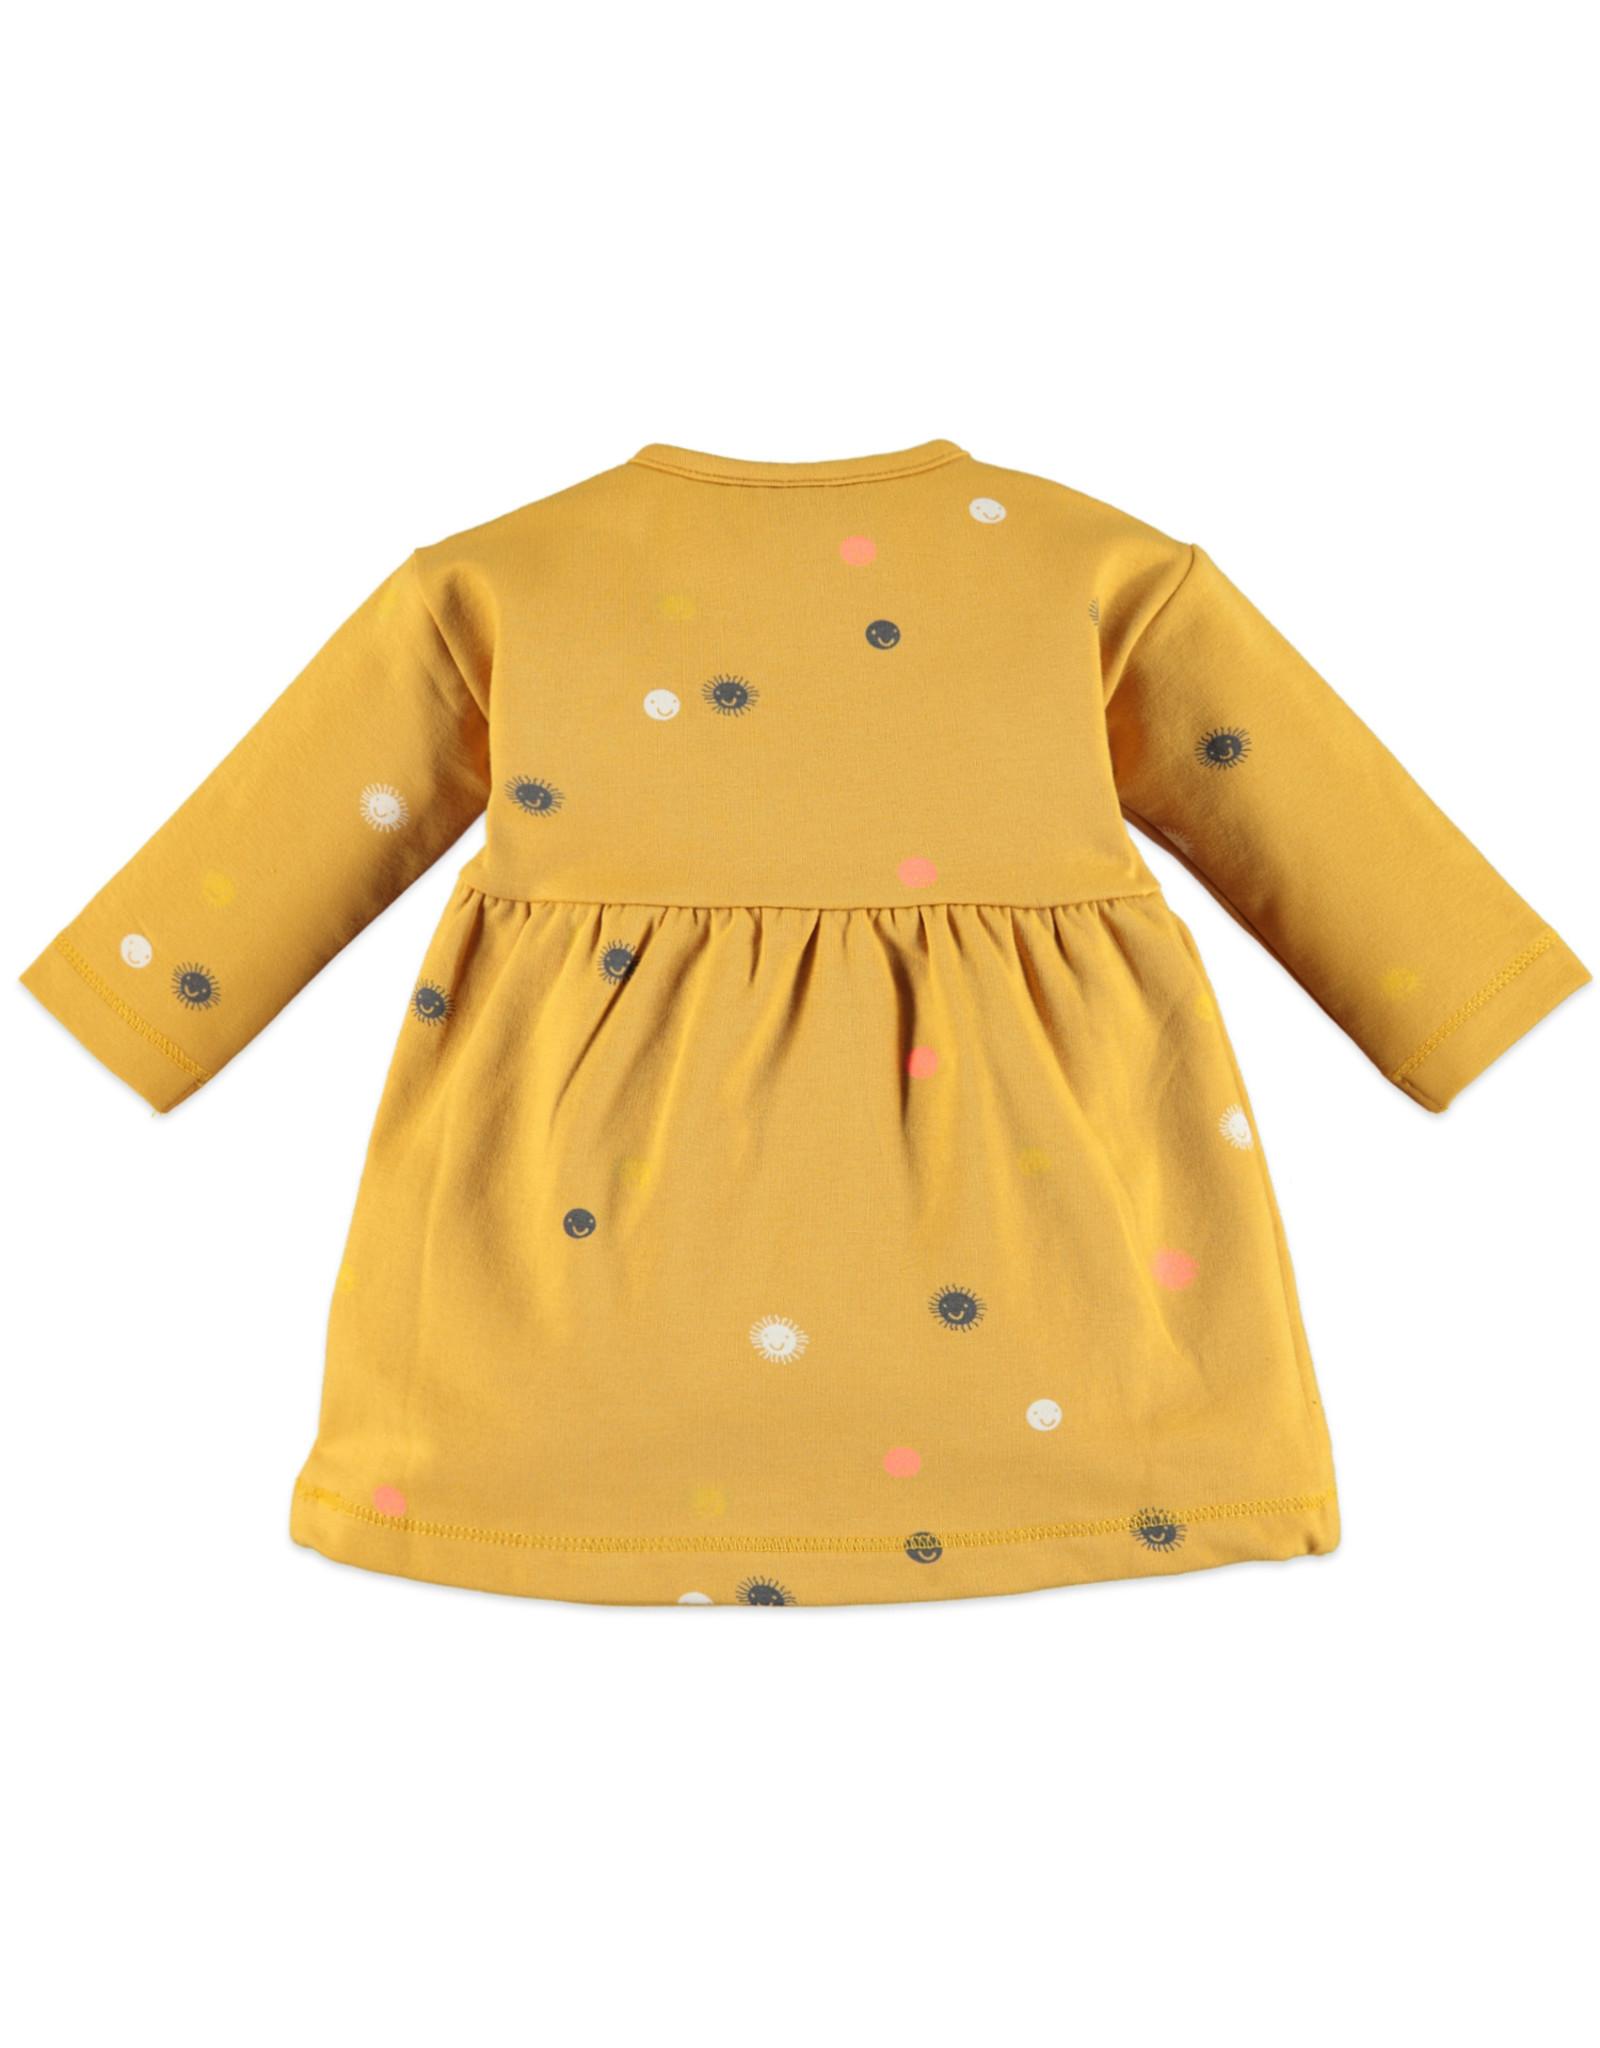 Babyface baby girls dress/ocher